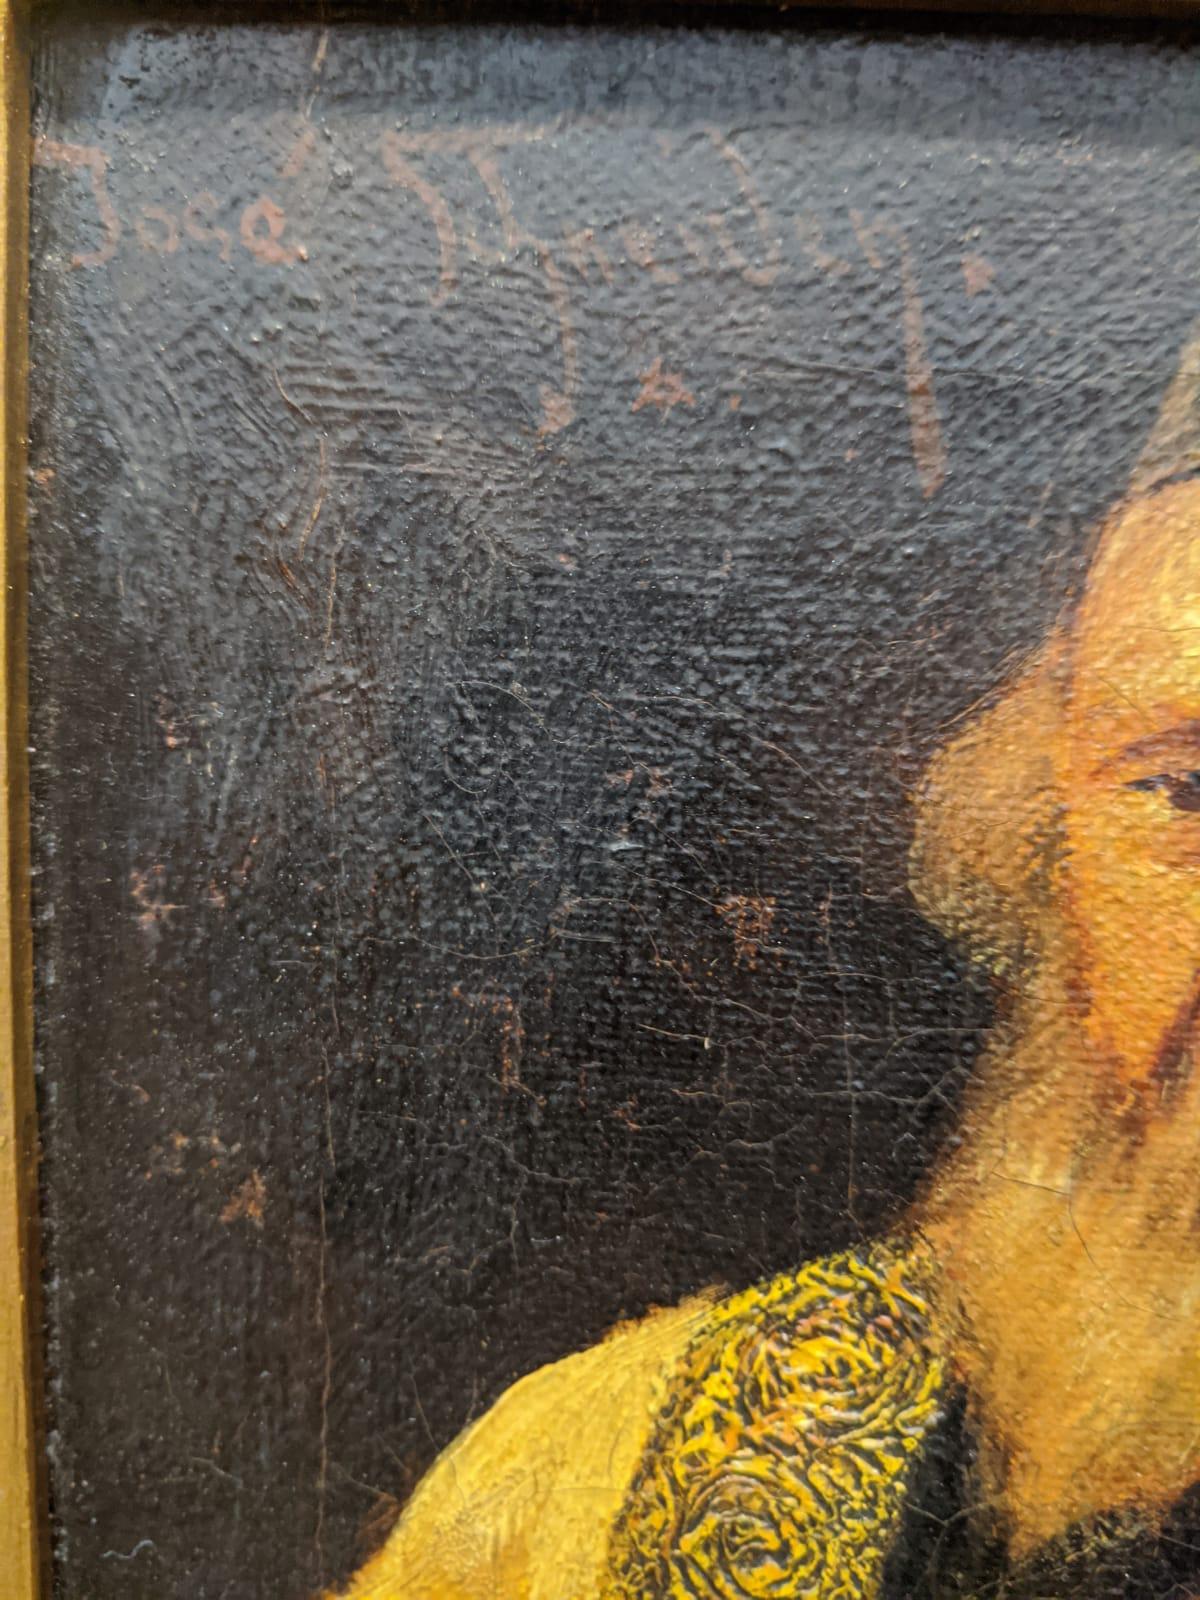 Jose Schneider (American/Spanish, 1848-1893), Rabbi Studying and Rabbi, oils on canvas, both - Image 3 of 7